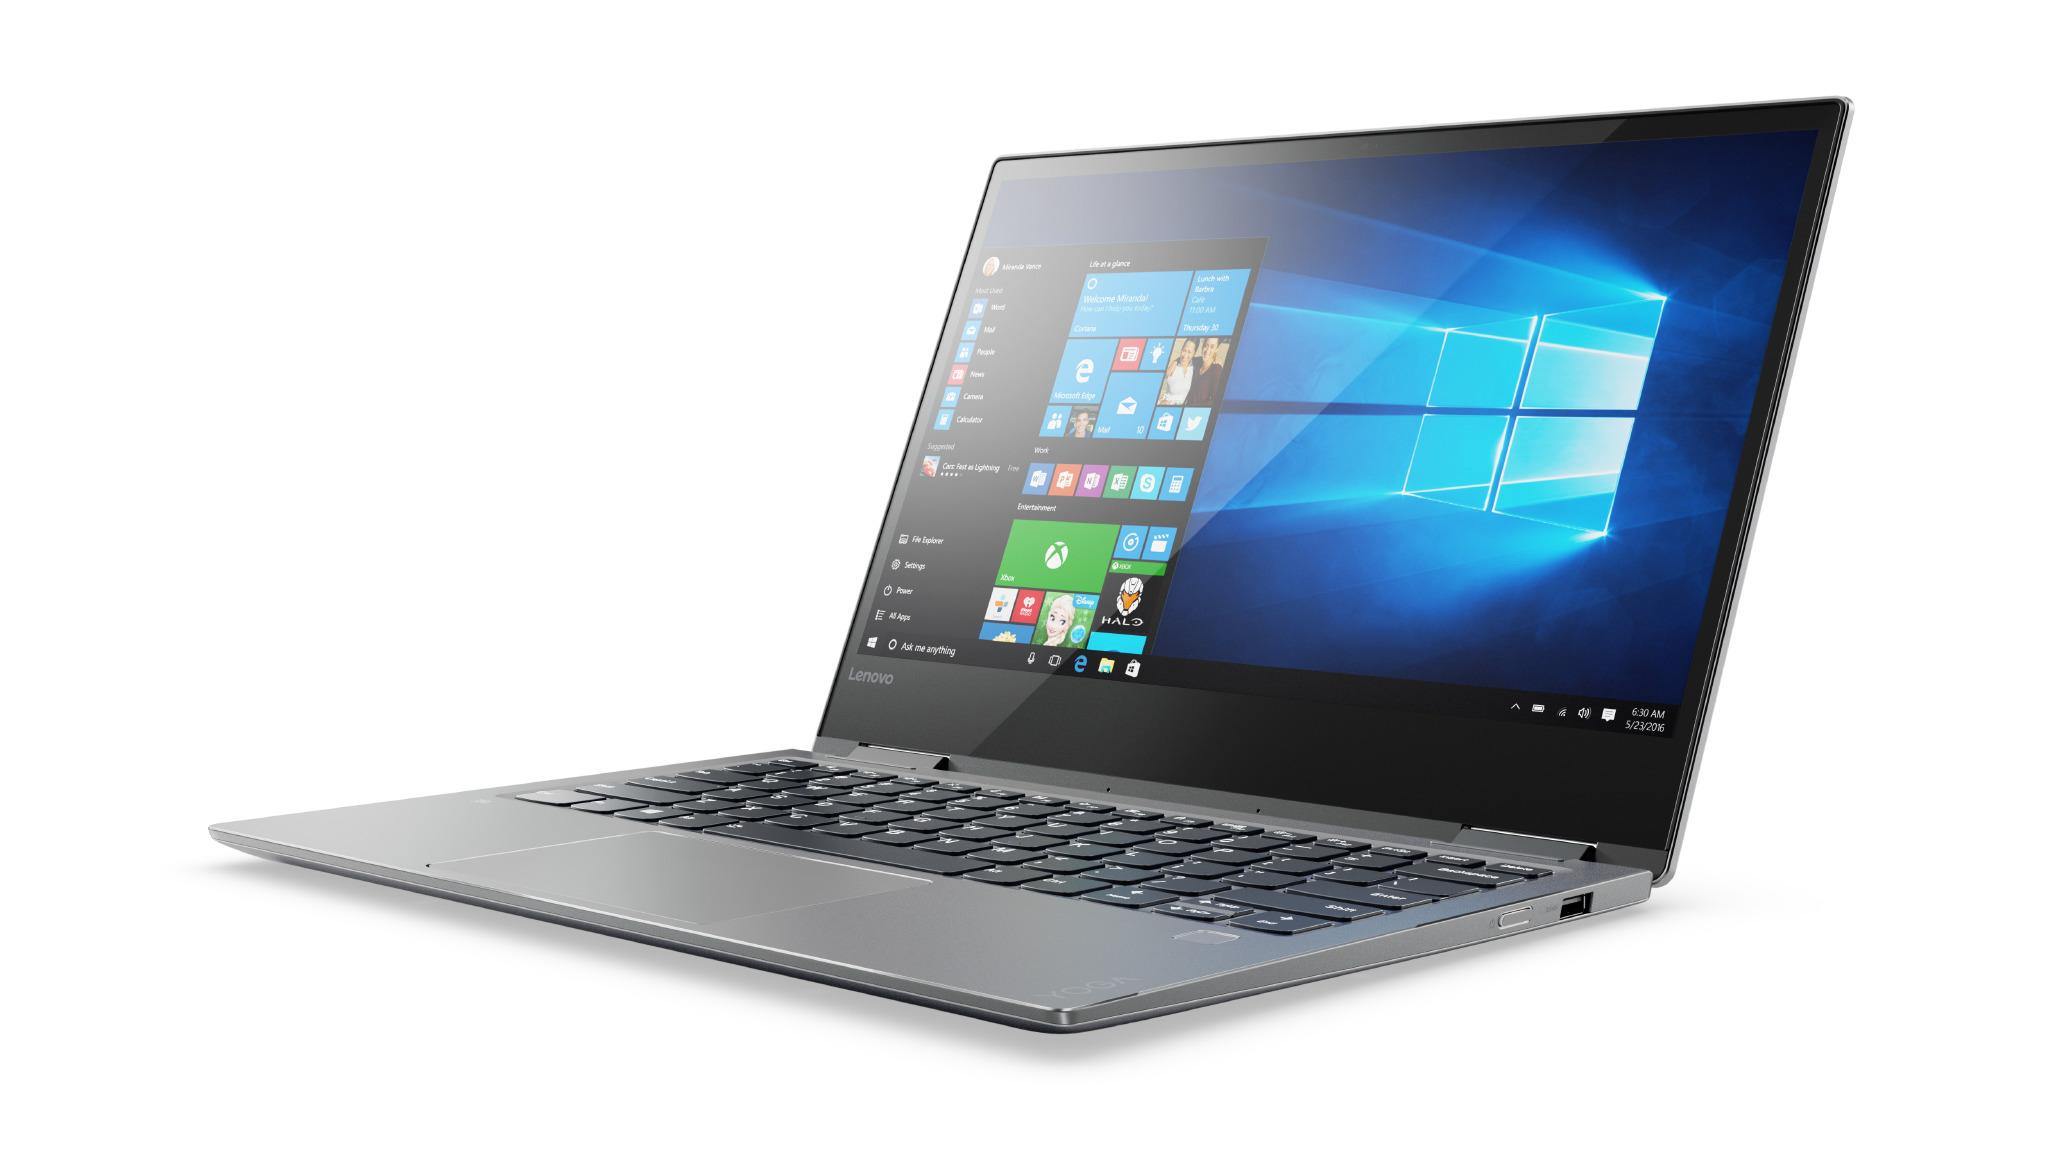 "Lenovo YOGA 720-13IKBR i5-8250U 3,40GHz/8GB/SSD 256GB/13,3"" FHD/IPS/AG/multitouch/FPR/WIN10 šedá 81C3001NCK"